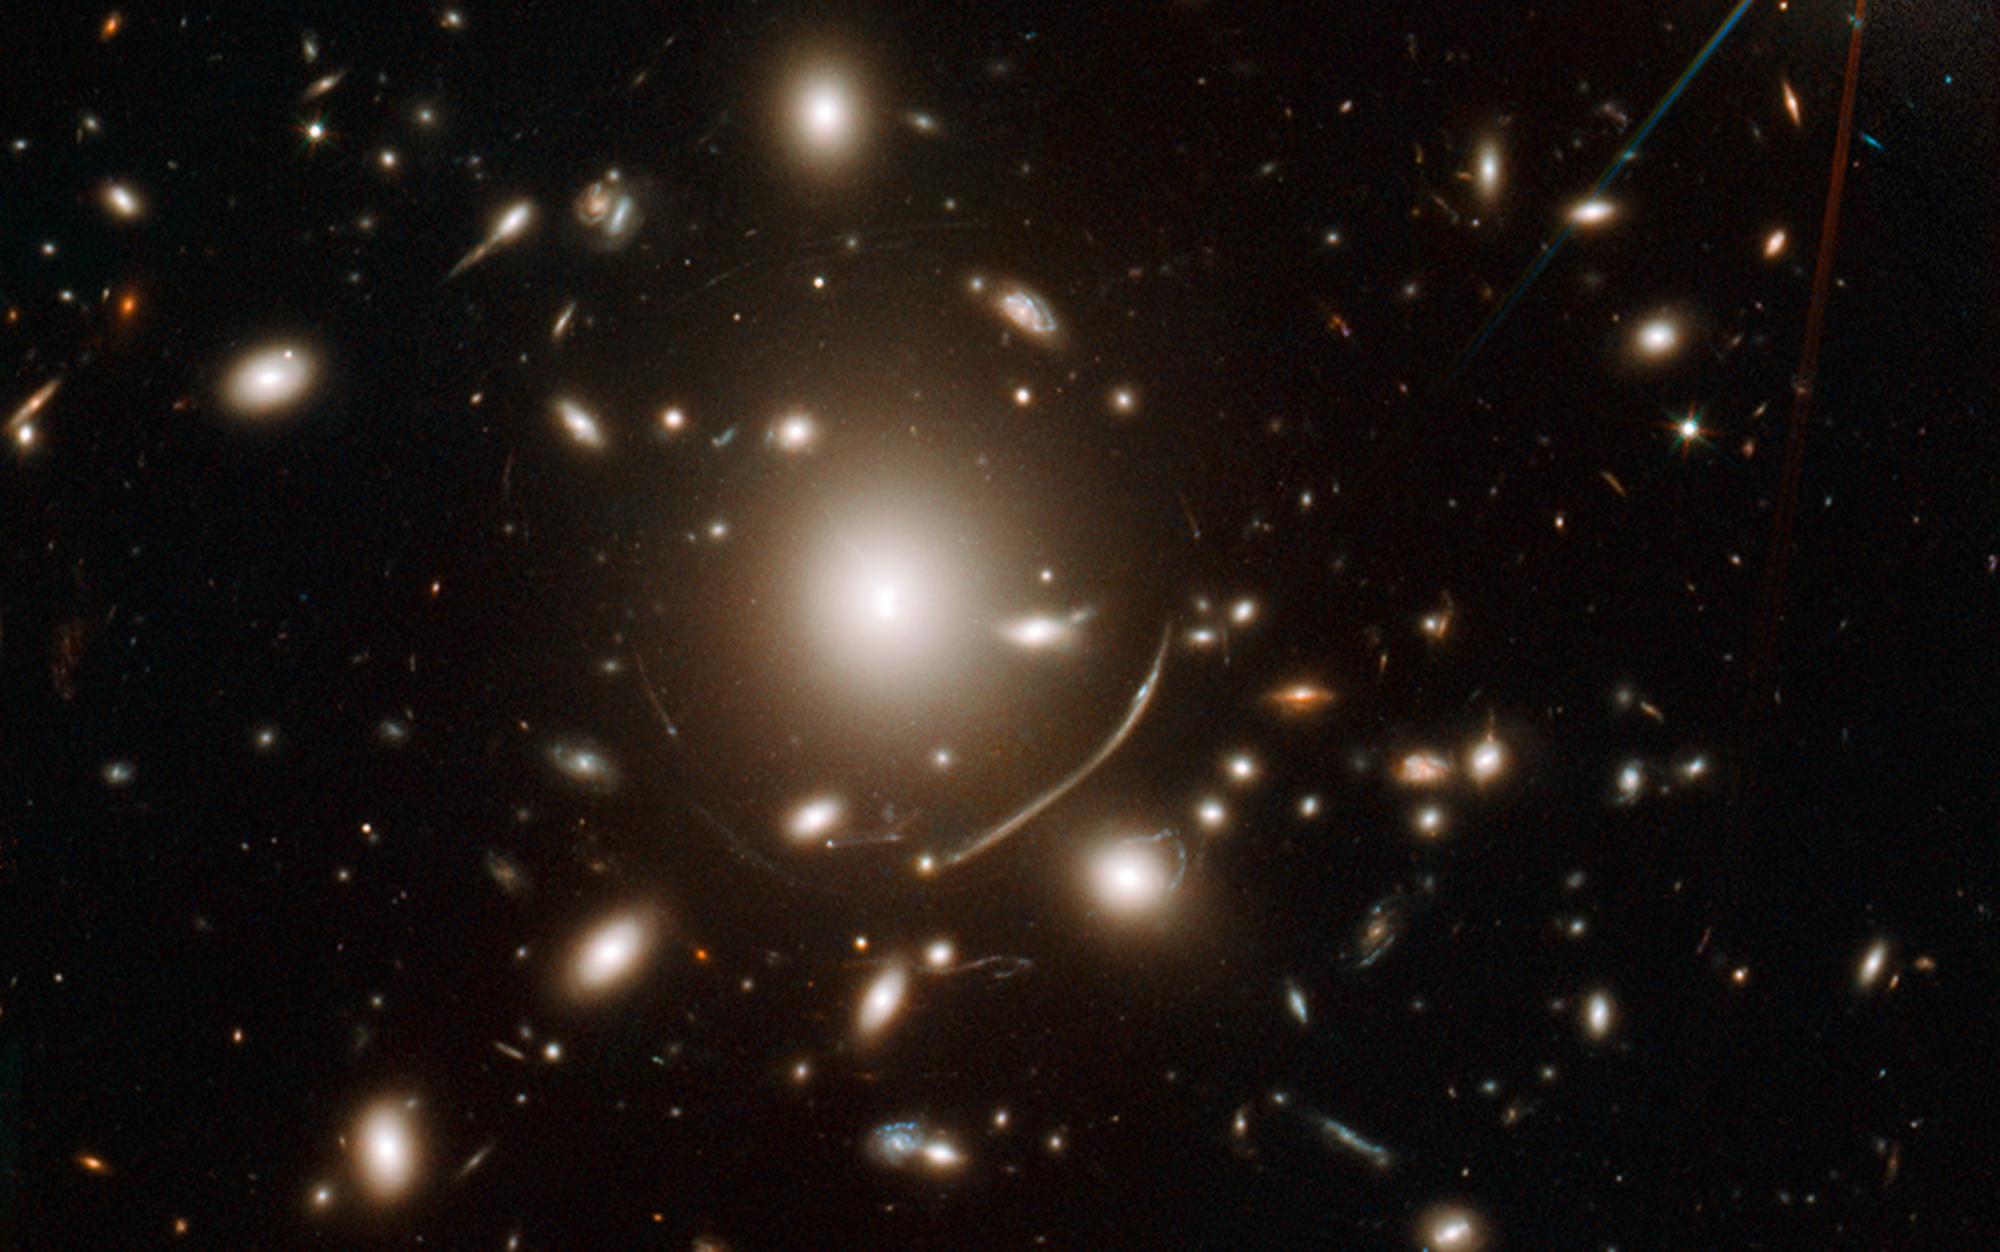 Is dark matter subatomic particles, a superfluid, or both? – Sabine Hossenfelder